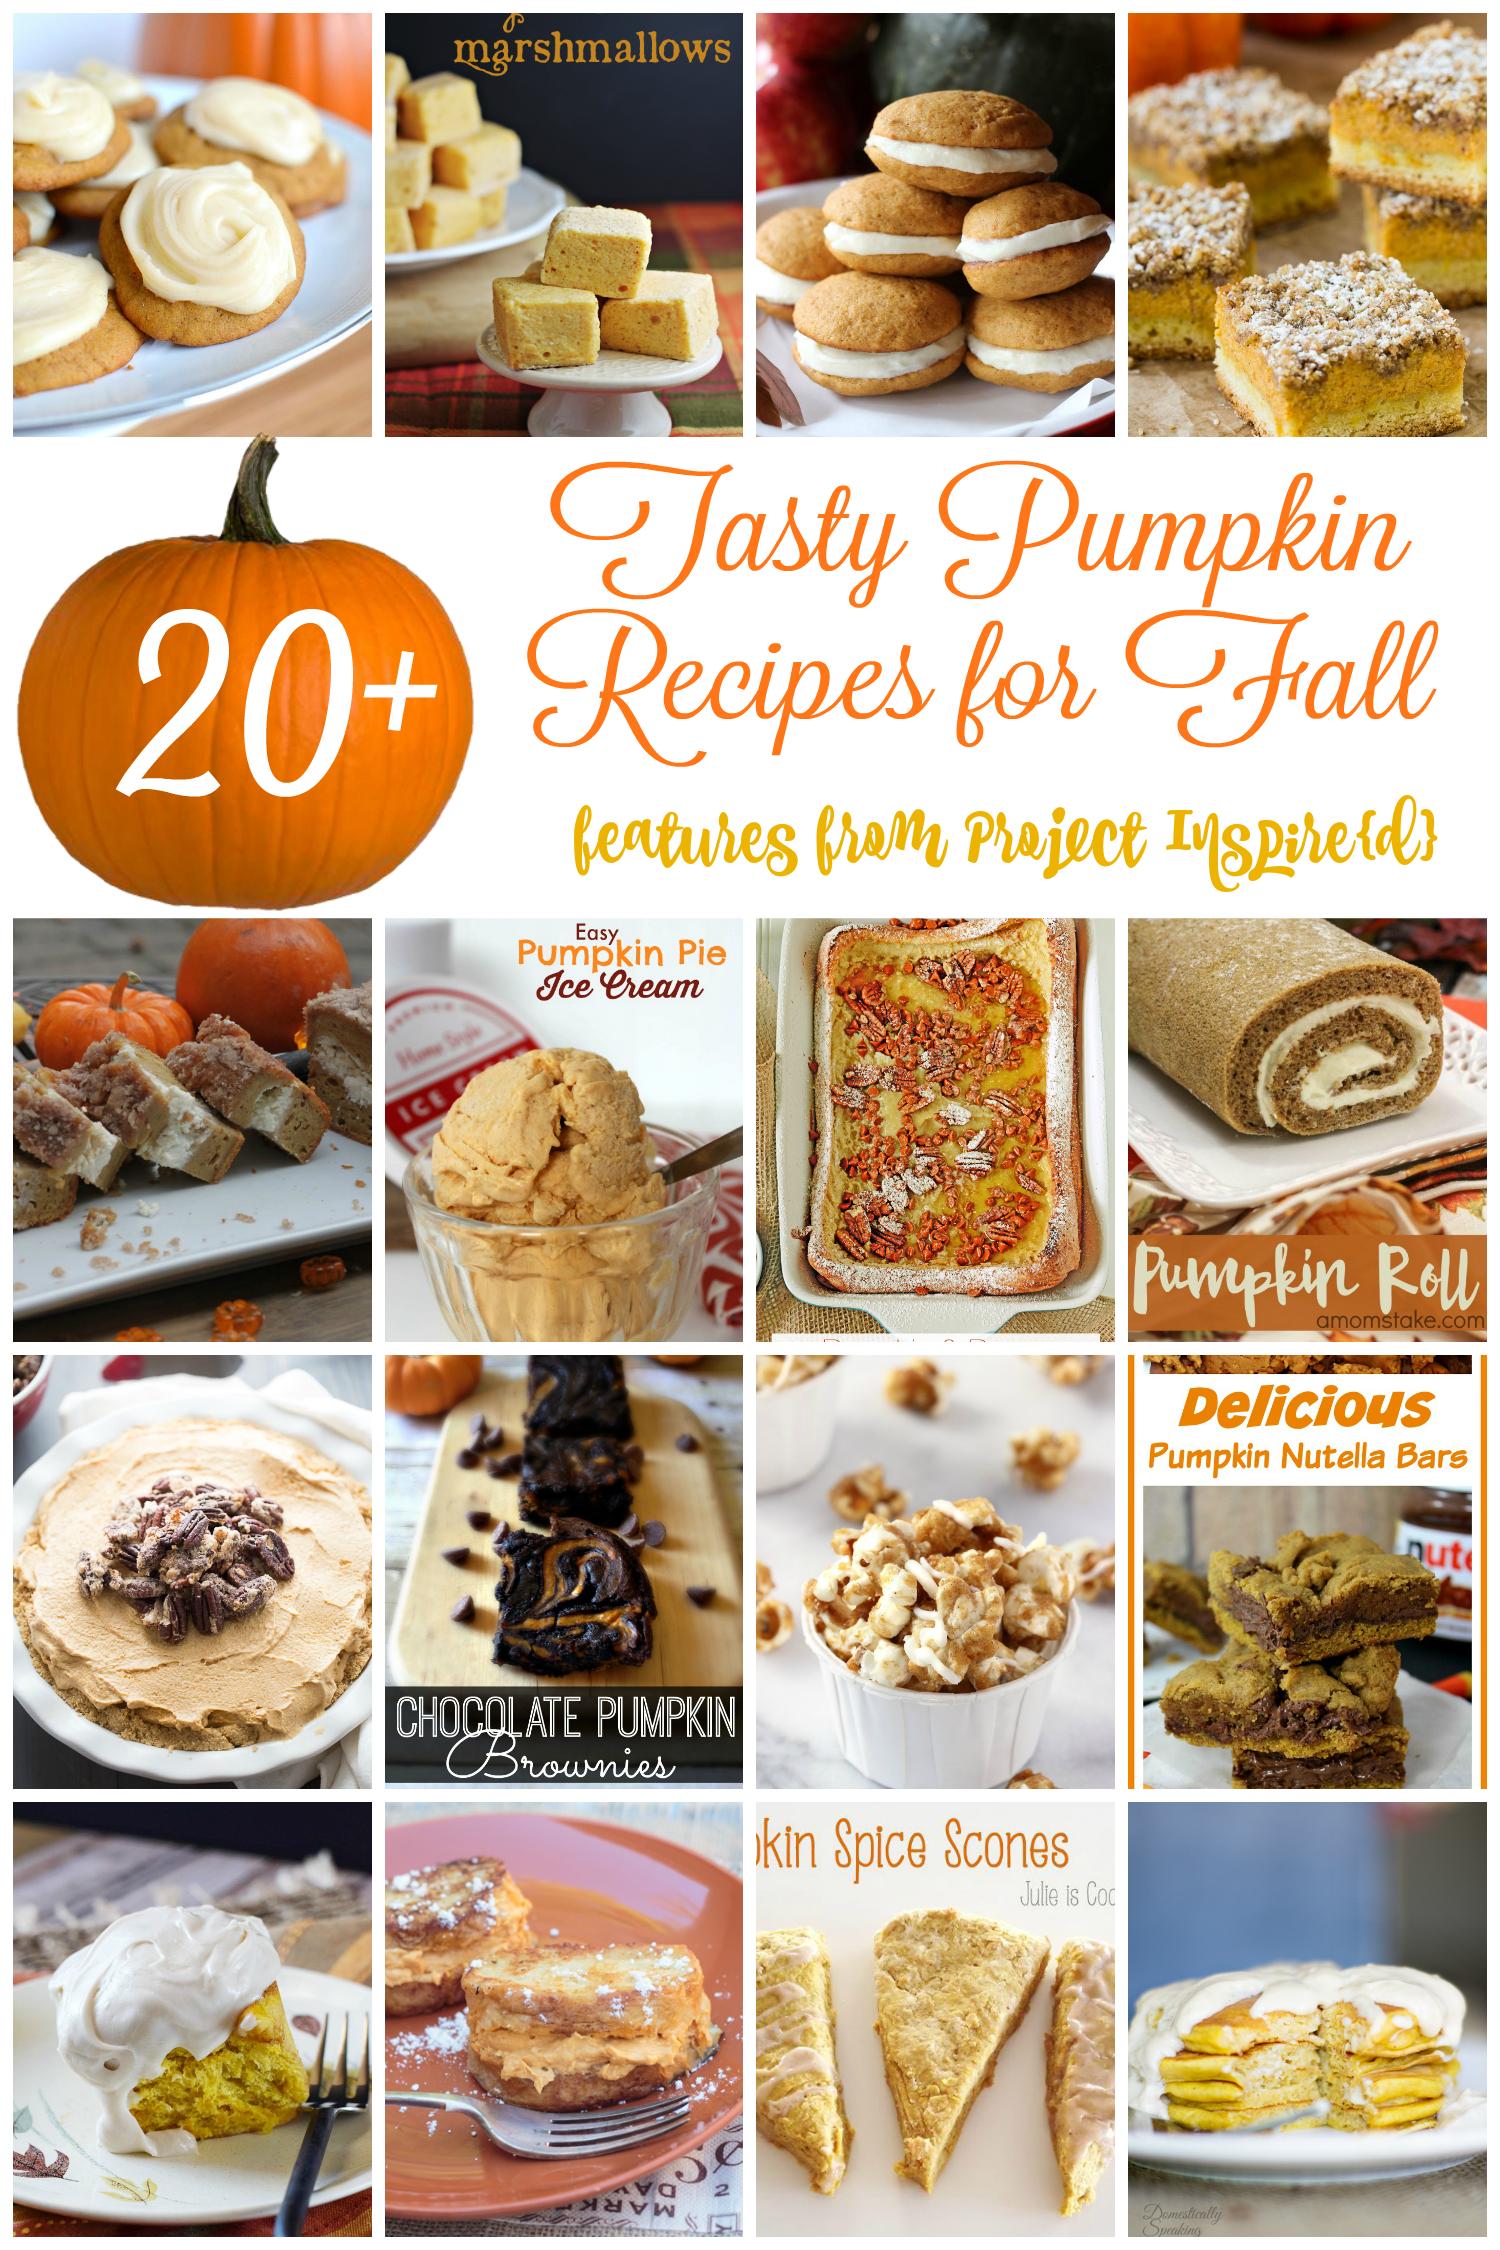 20+ Tasty Pumpkin Recipes for Fall